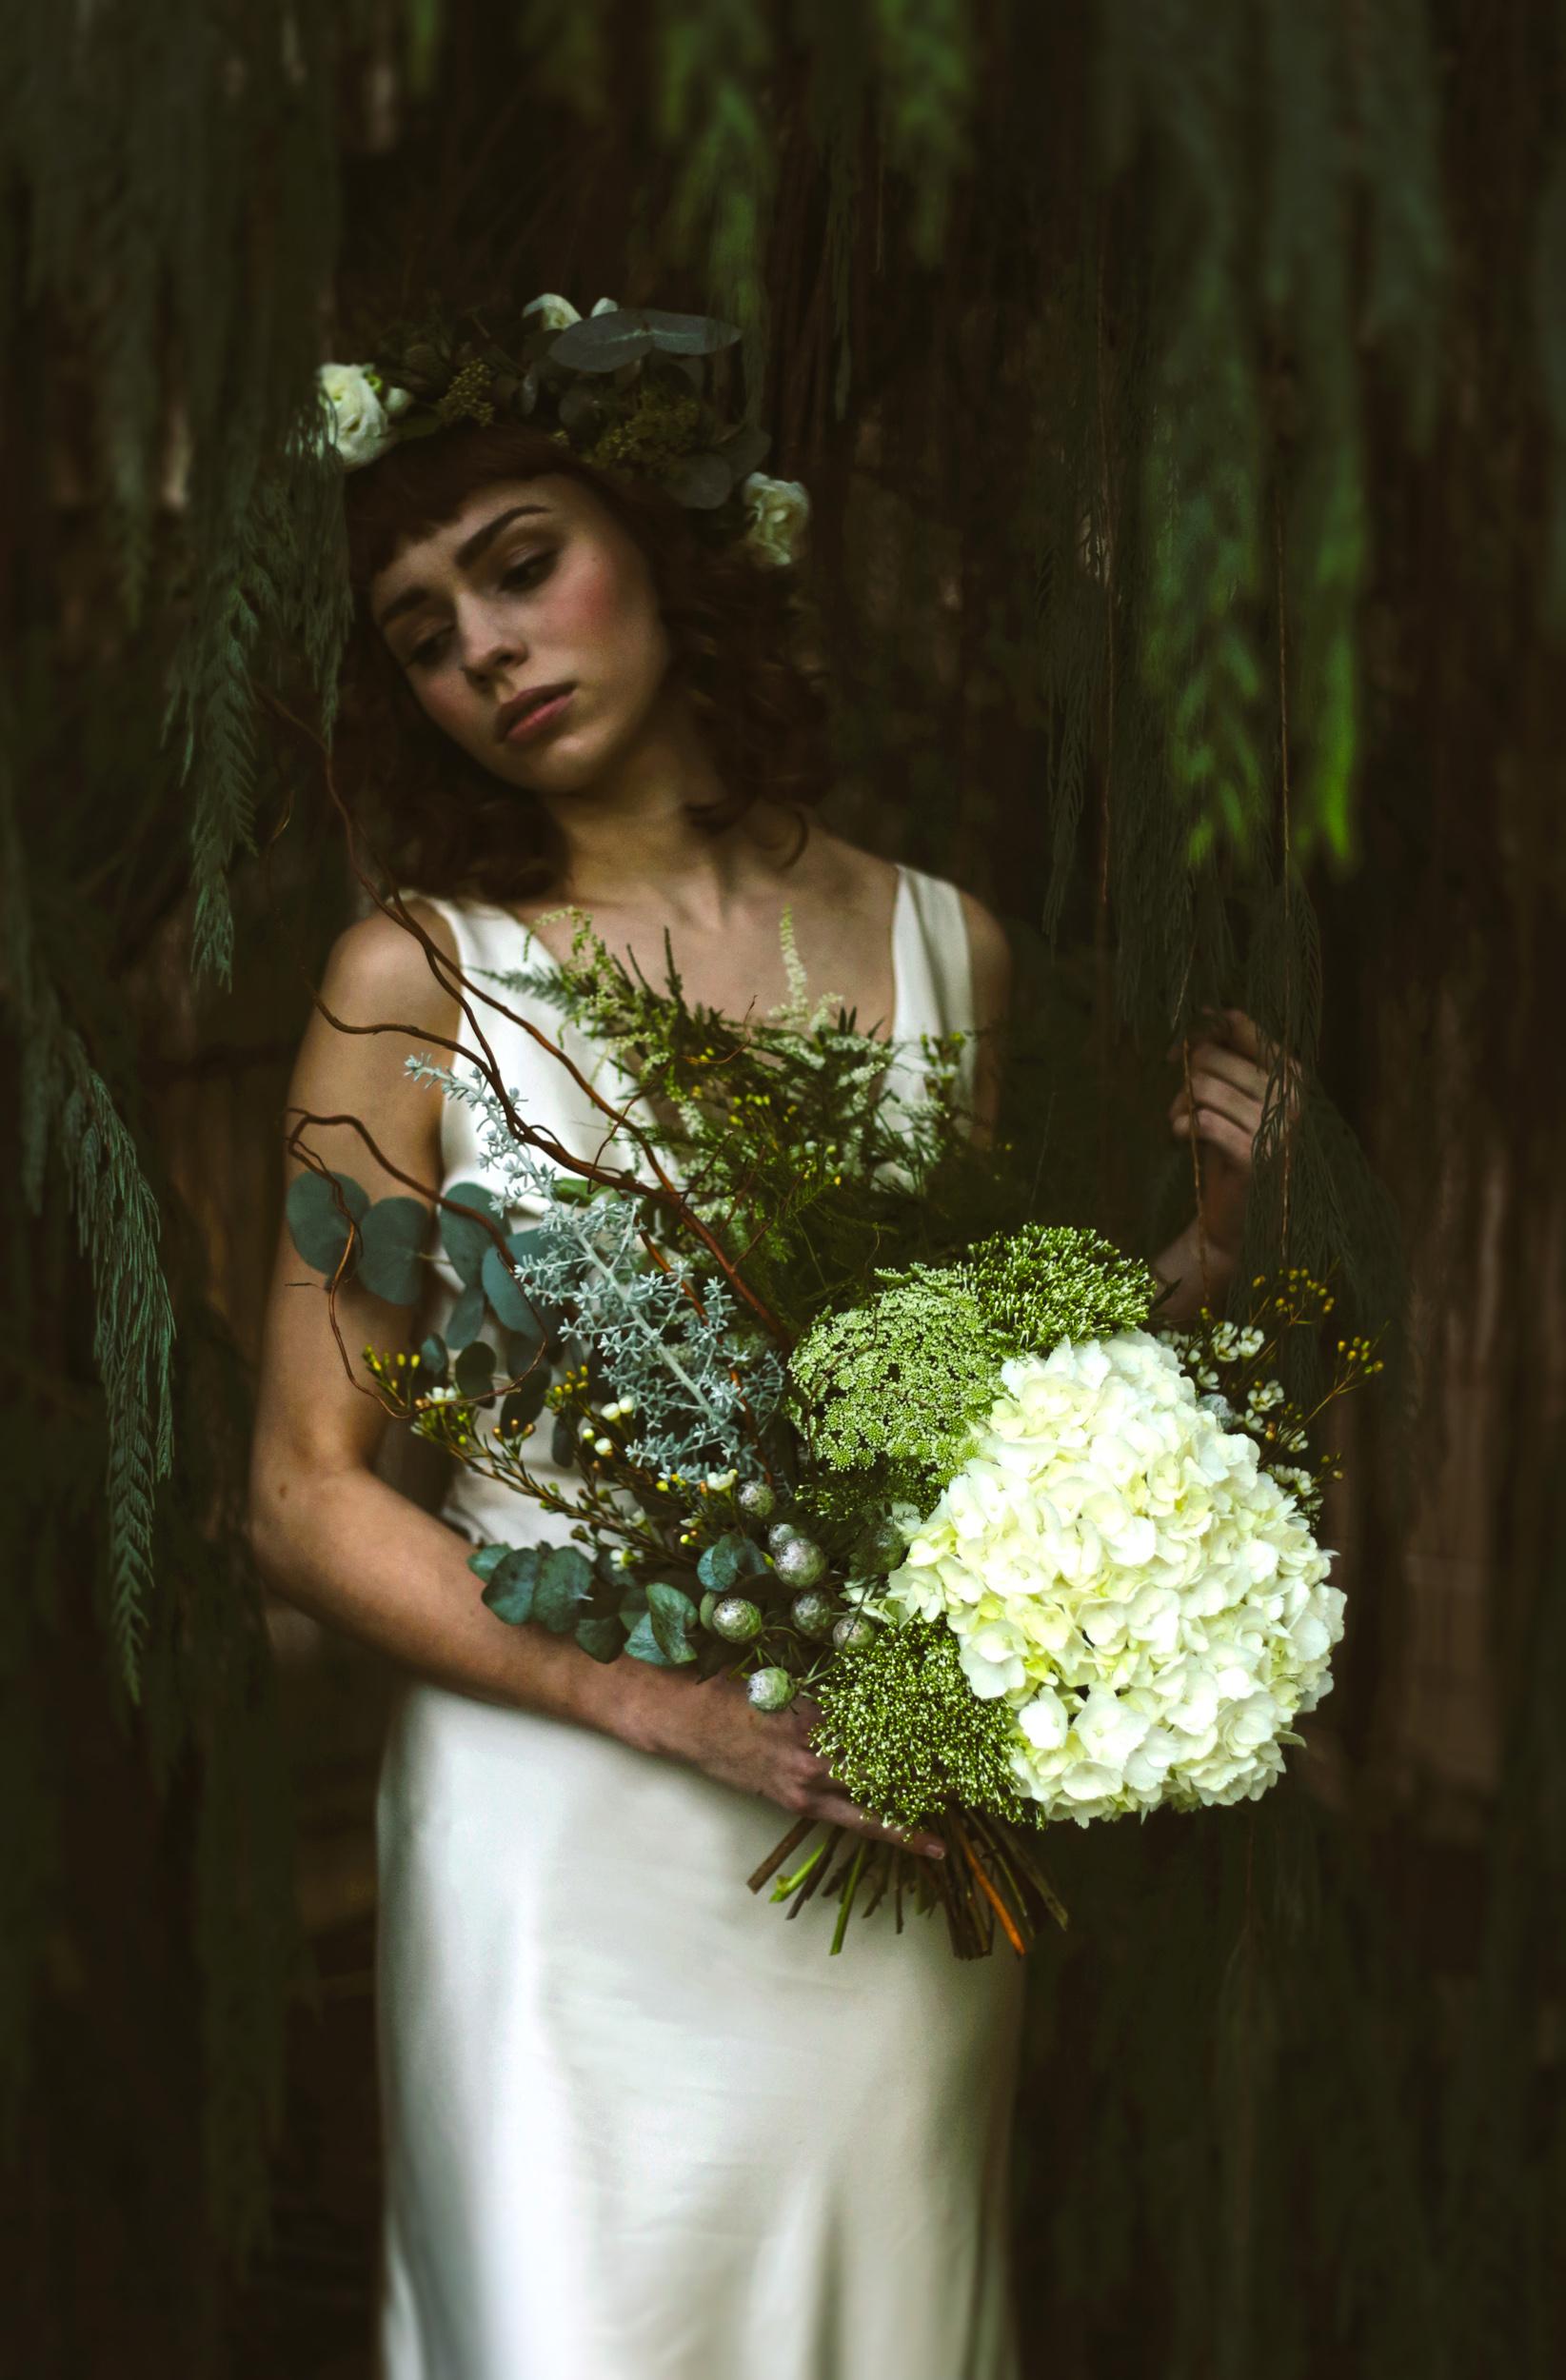 Winter-Bridal-Kate-Beaumont-Shelley-Richmond-Vintage-Wedding-Dress-5.jpg